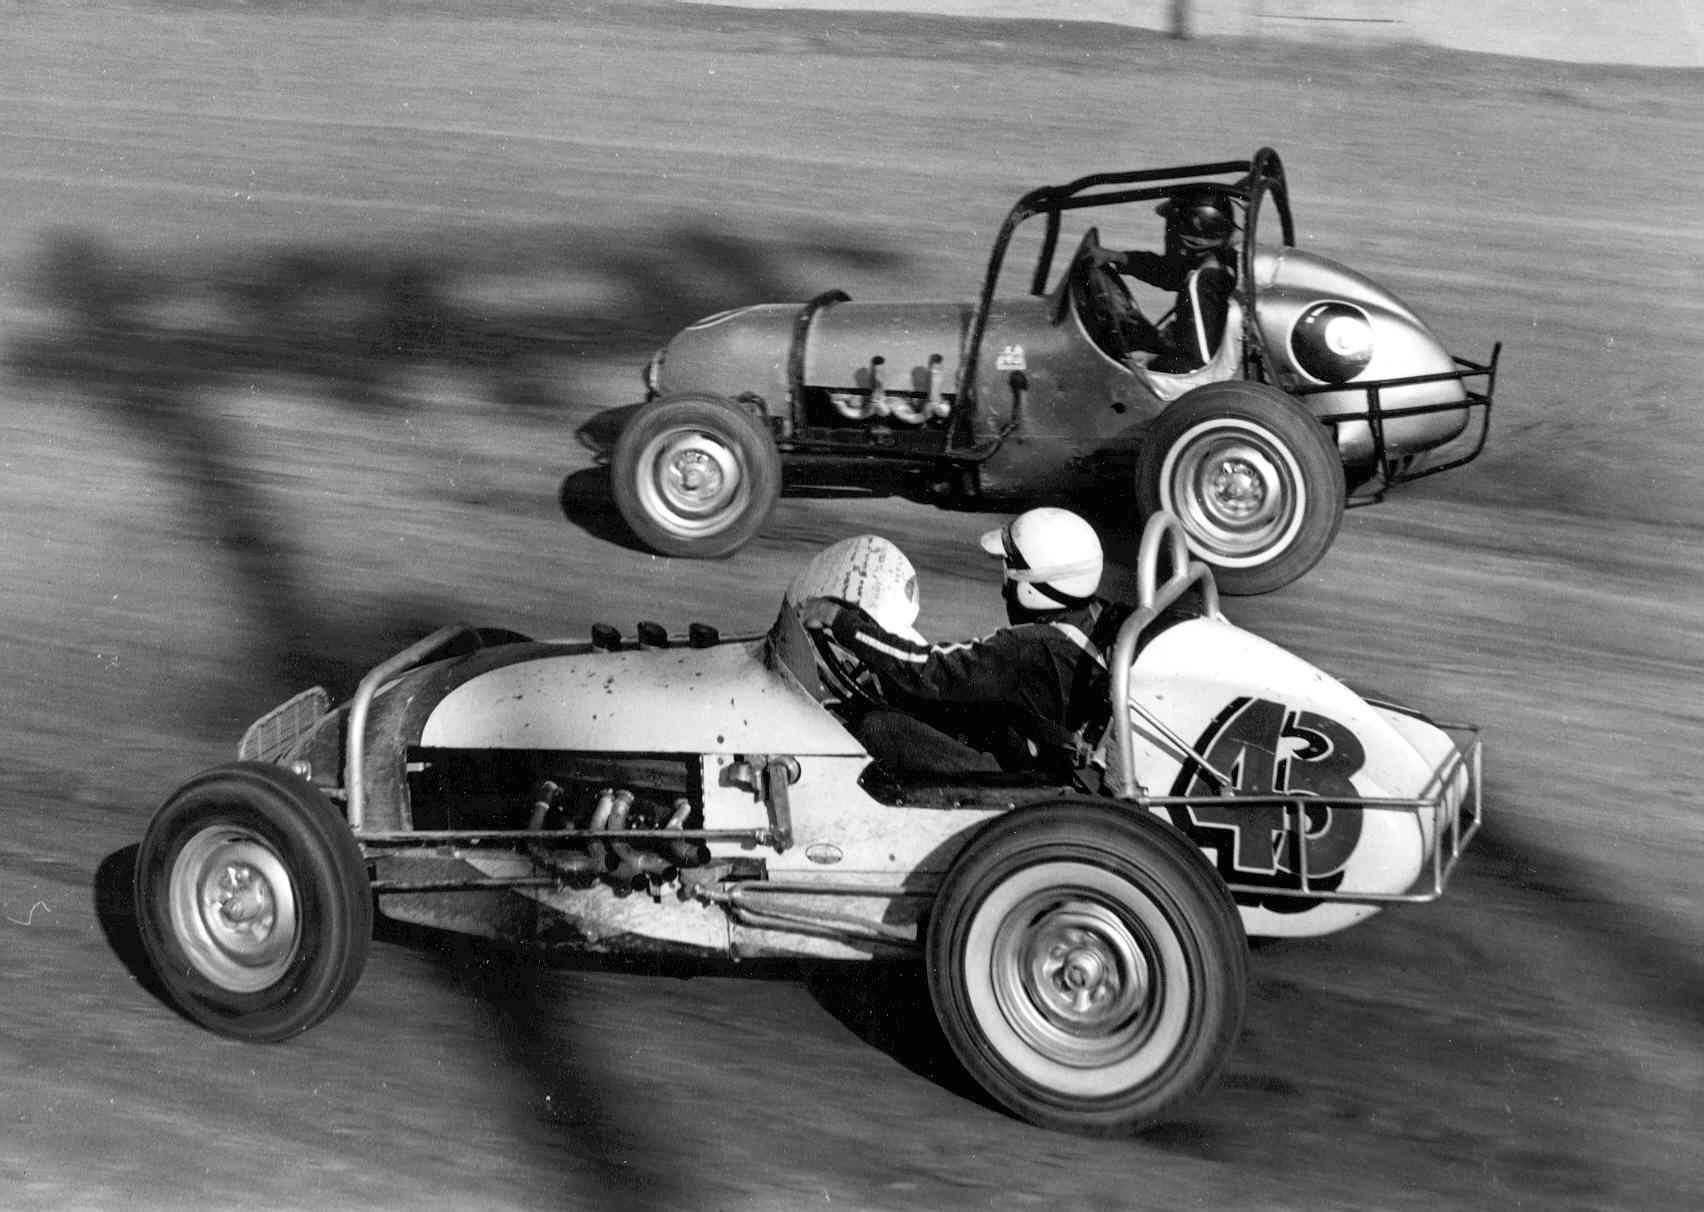 Grady Wade Powering The Selenke Chevy through a corner